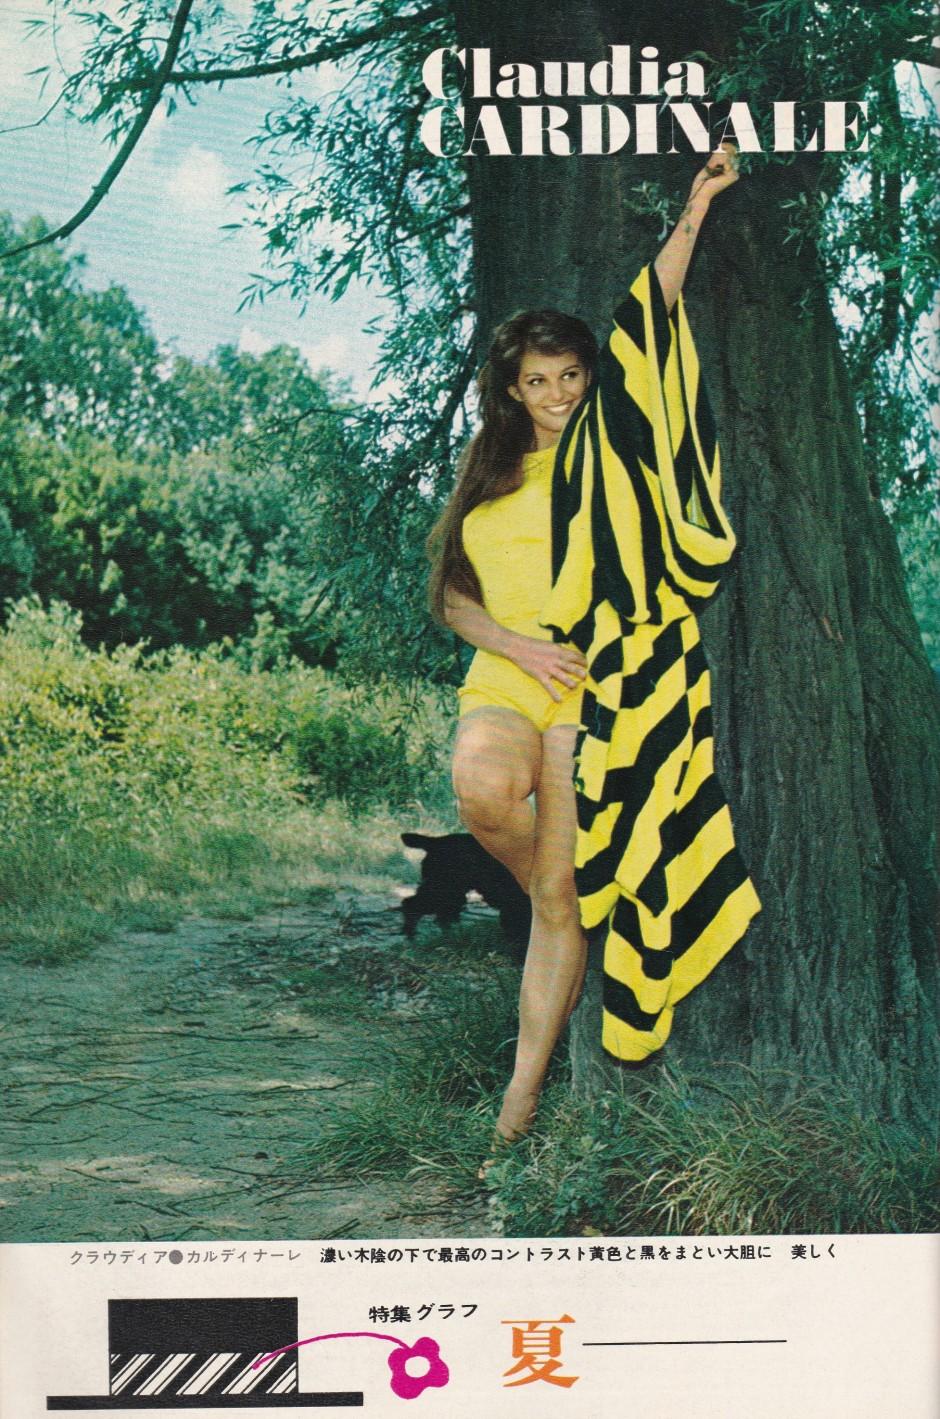 Eiga no Tomo_August 1964_Claudia Cardinale